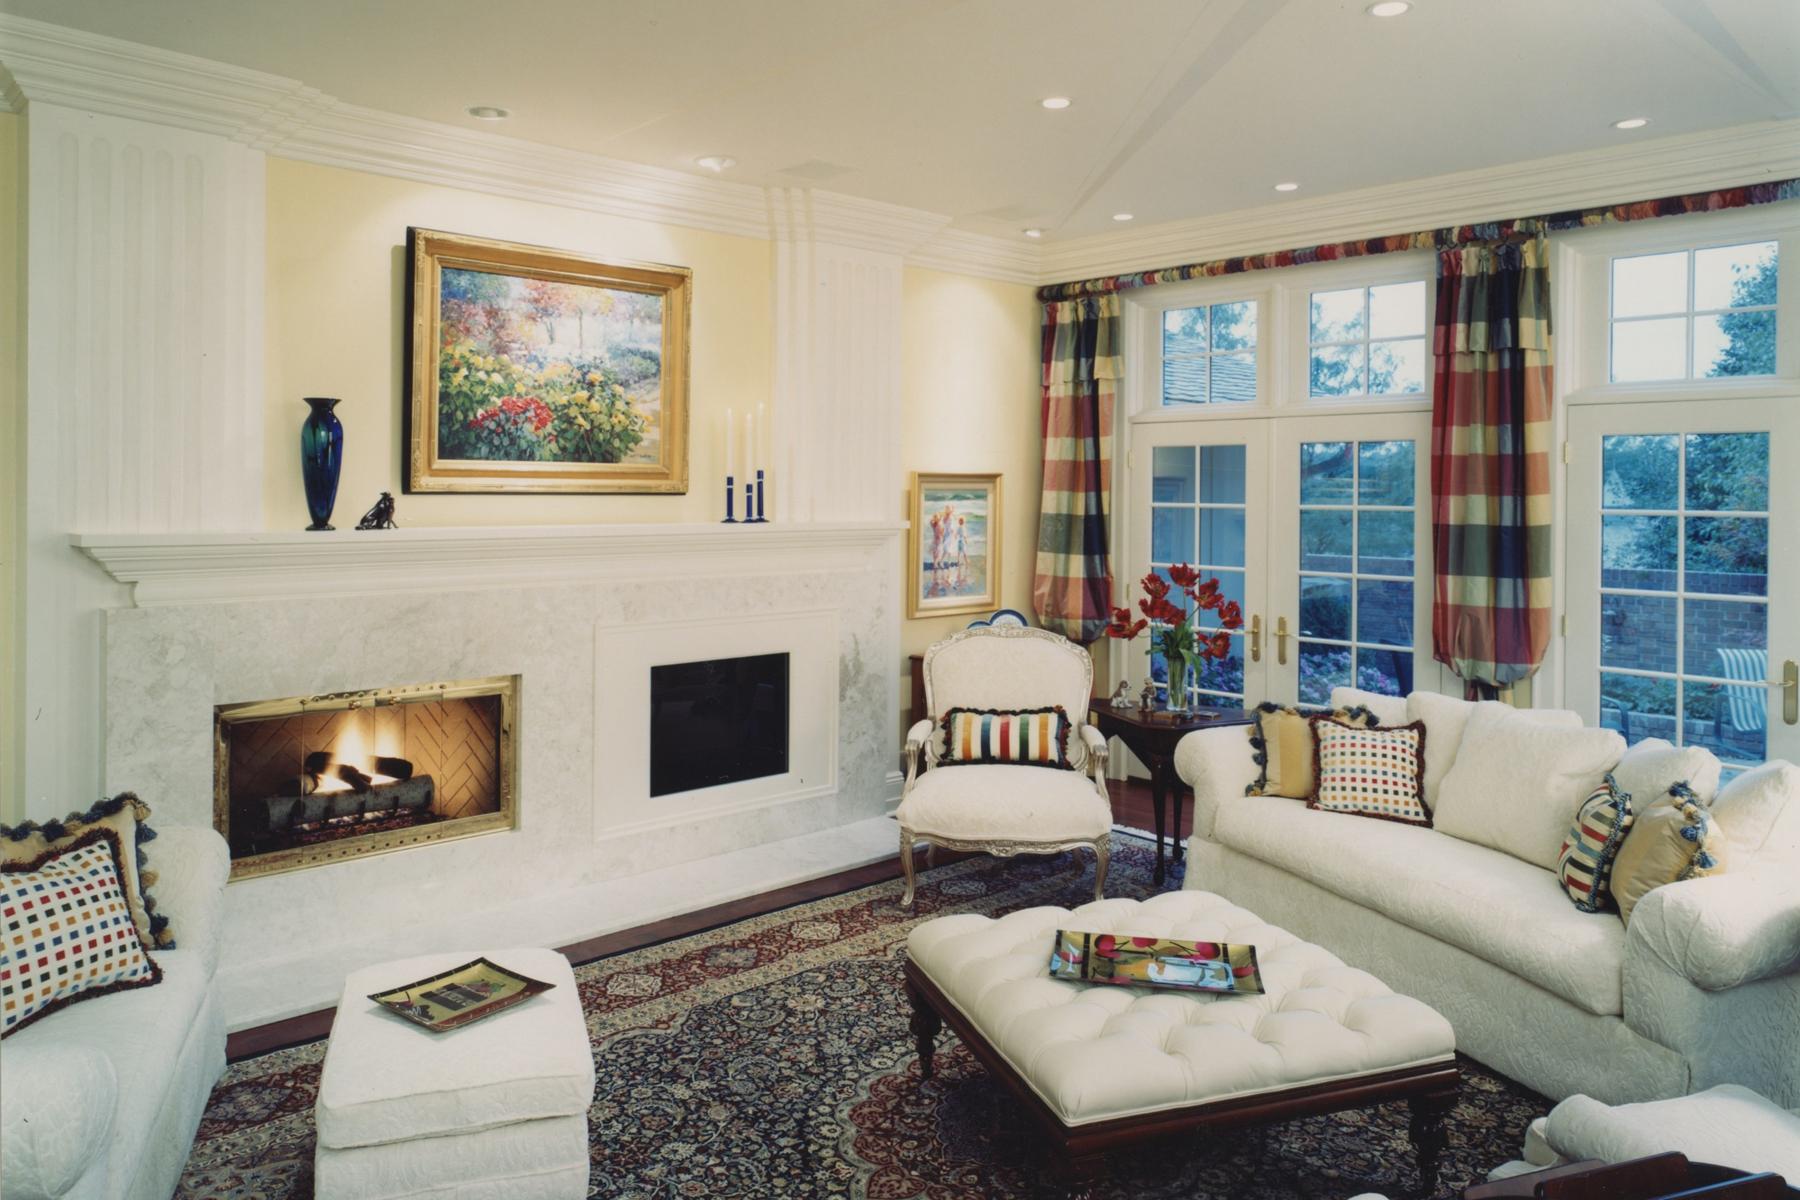 TV-Above-Fireplace.jpeg